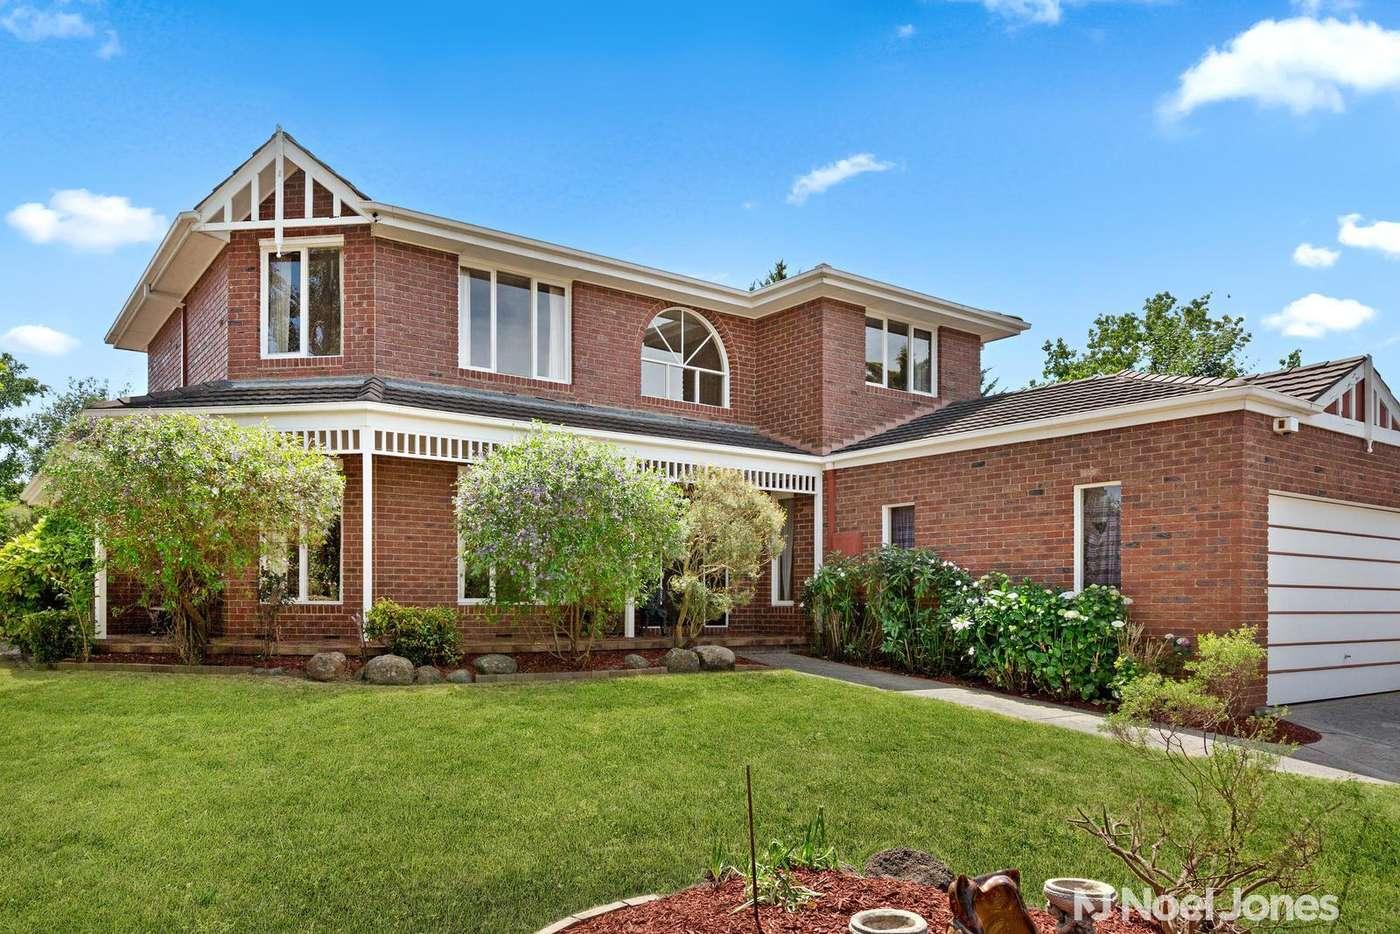 Main view of Homely house listing, 15 Bemboka Road, Warranwood VIC 3134